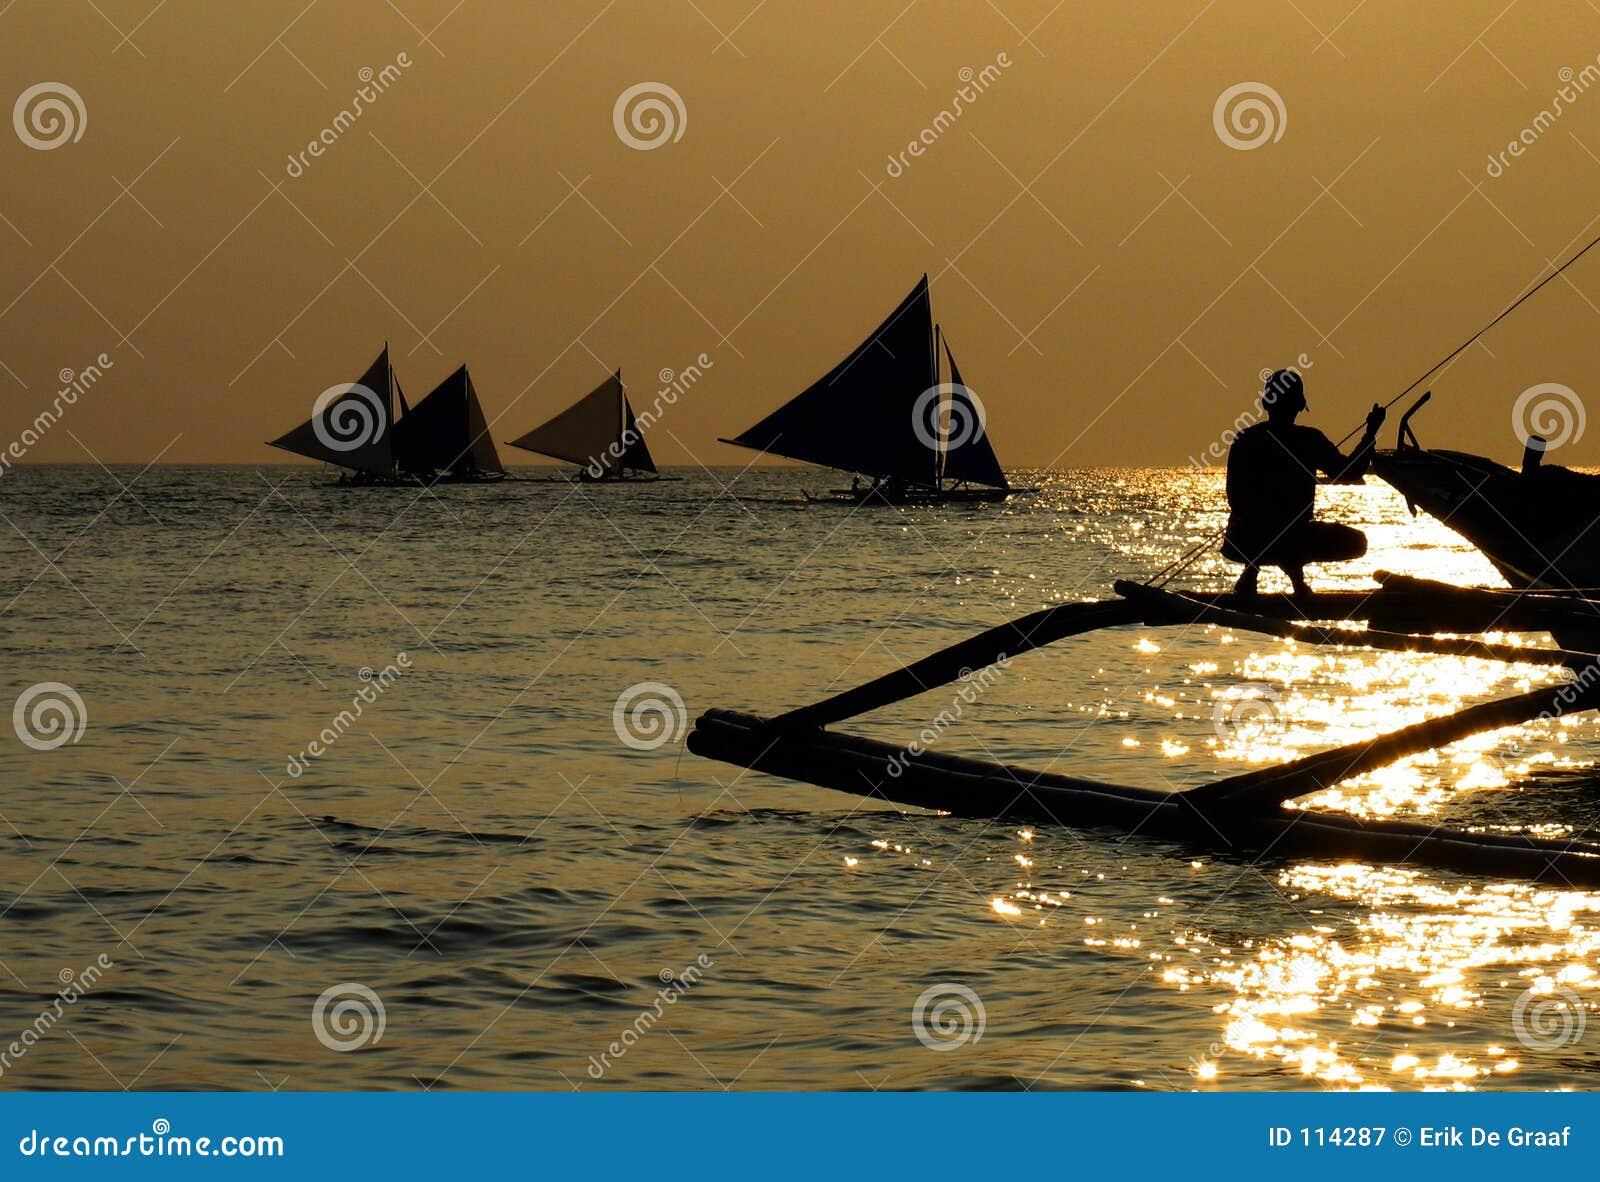 Afternoon sailing 2